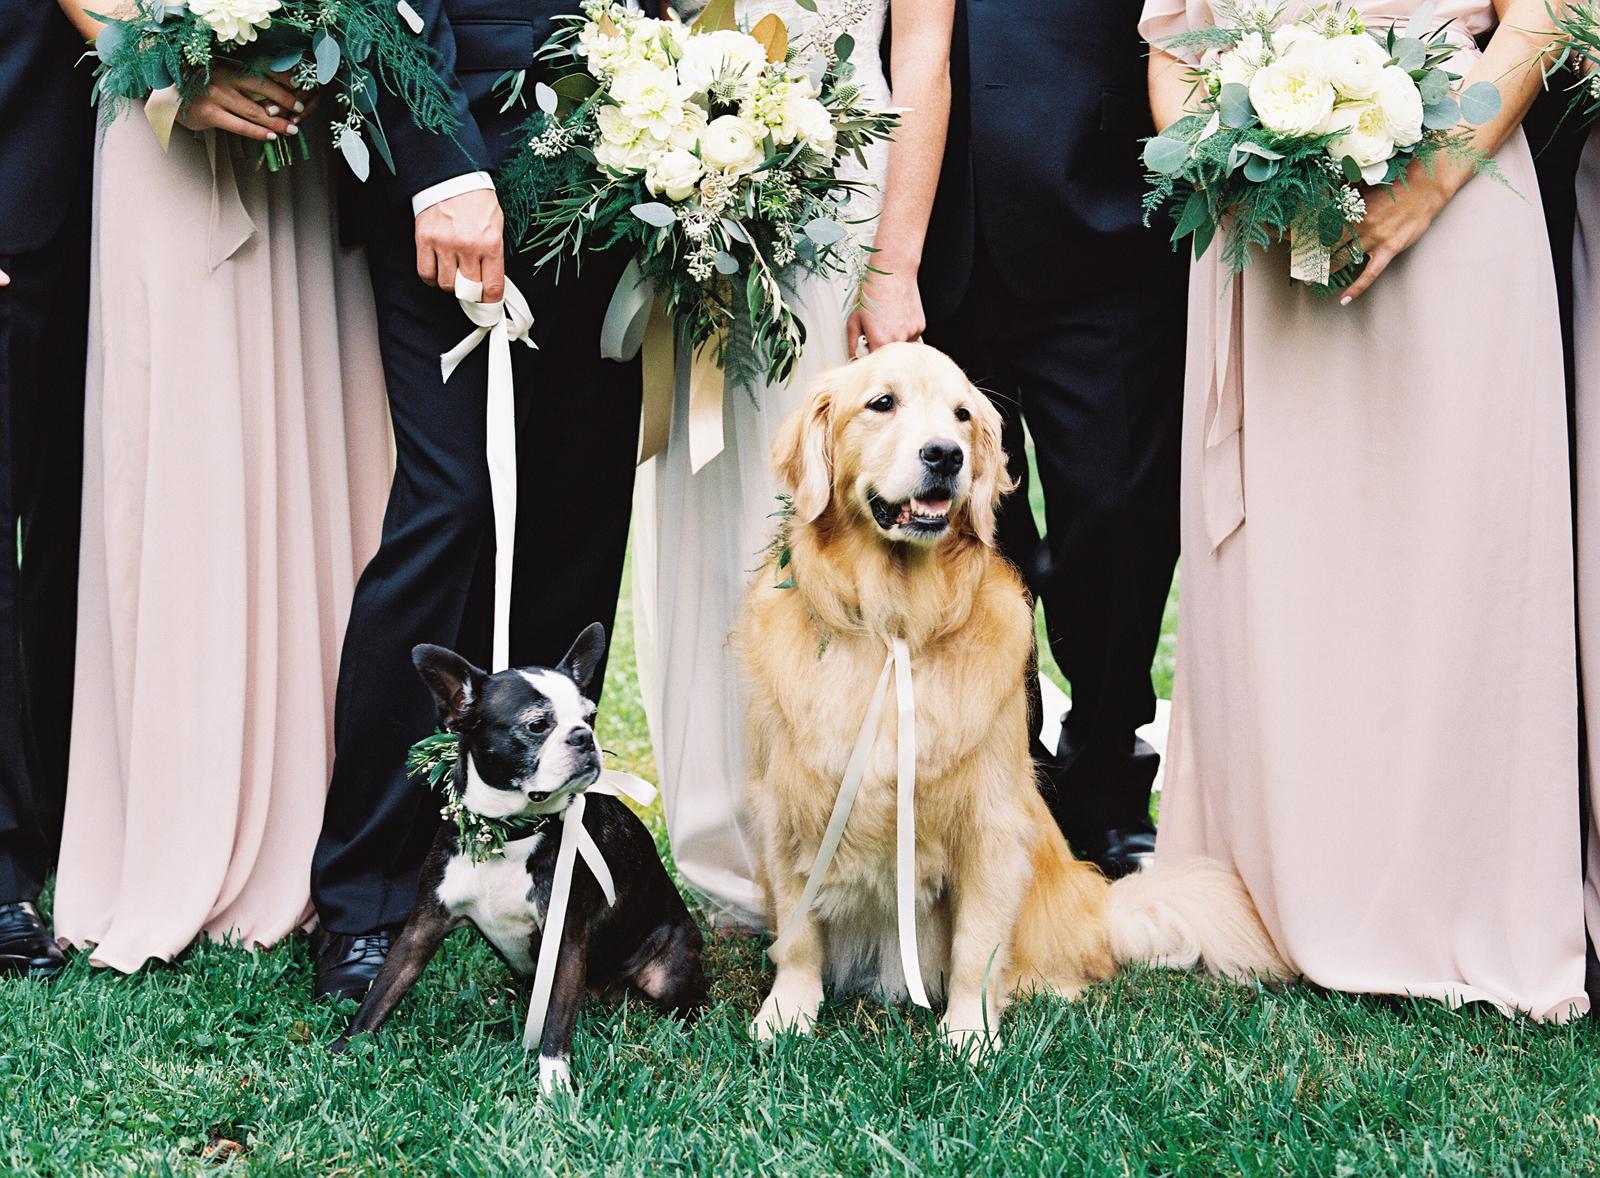 old_edwards_inn_wedding_Natalie_watson_photography_057.jpg